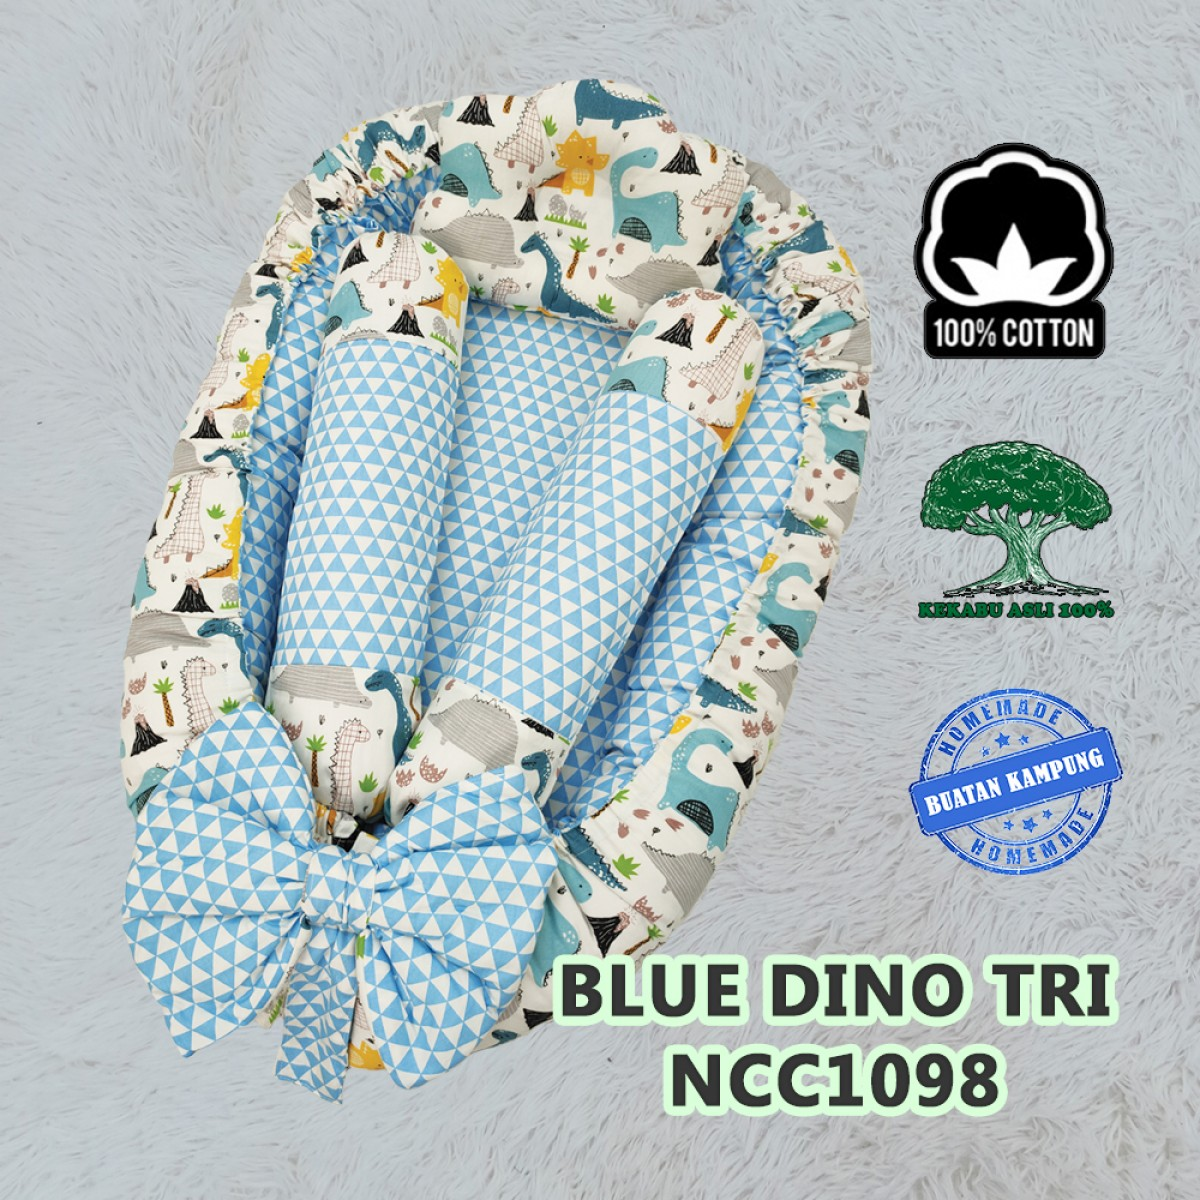 Blue Dino Tri - Kico Baby Center